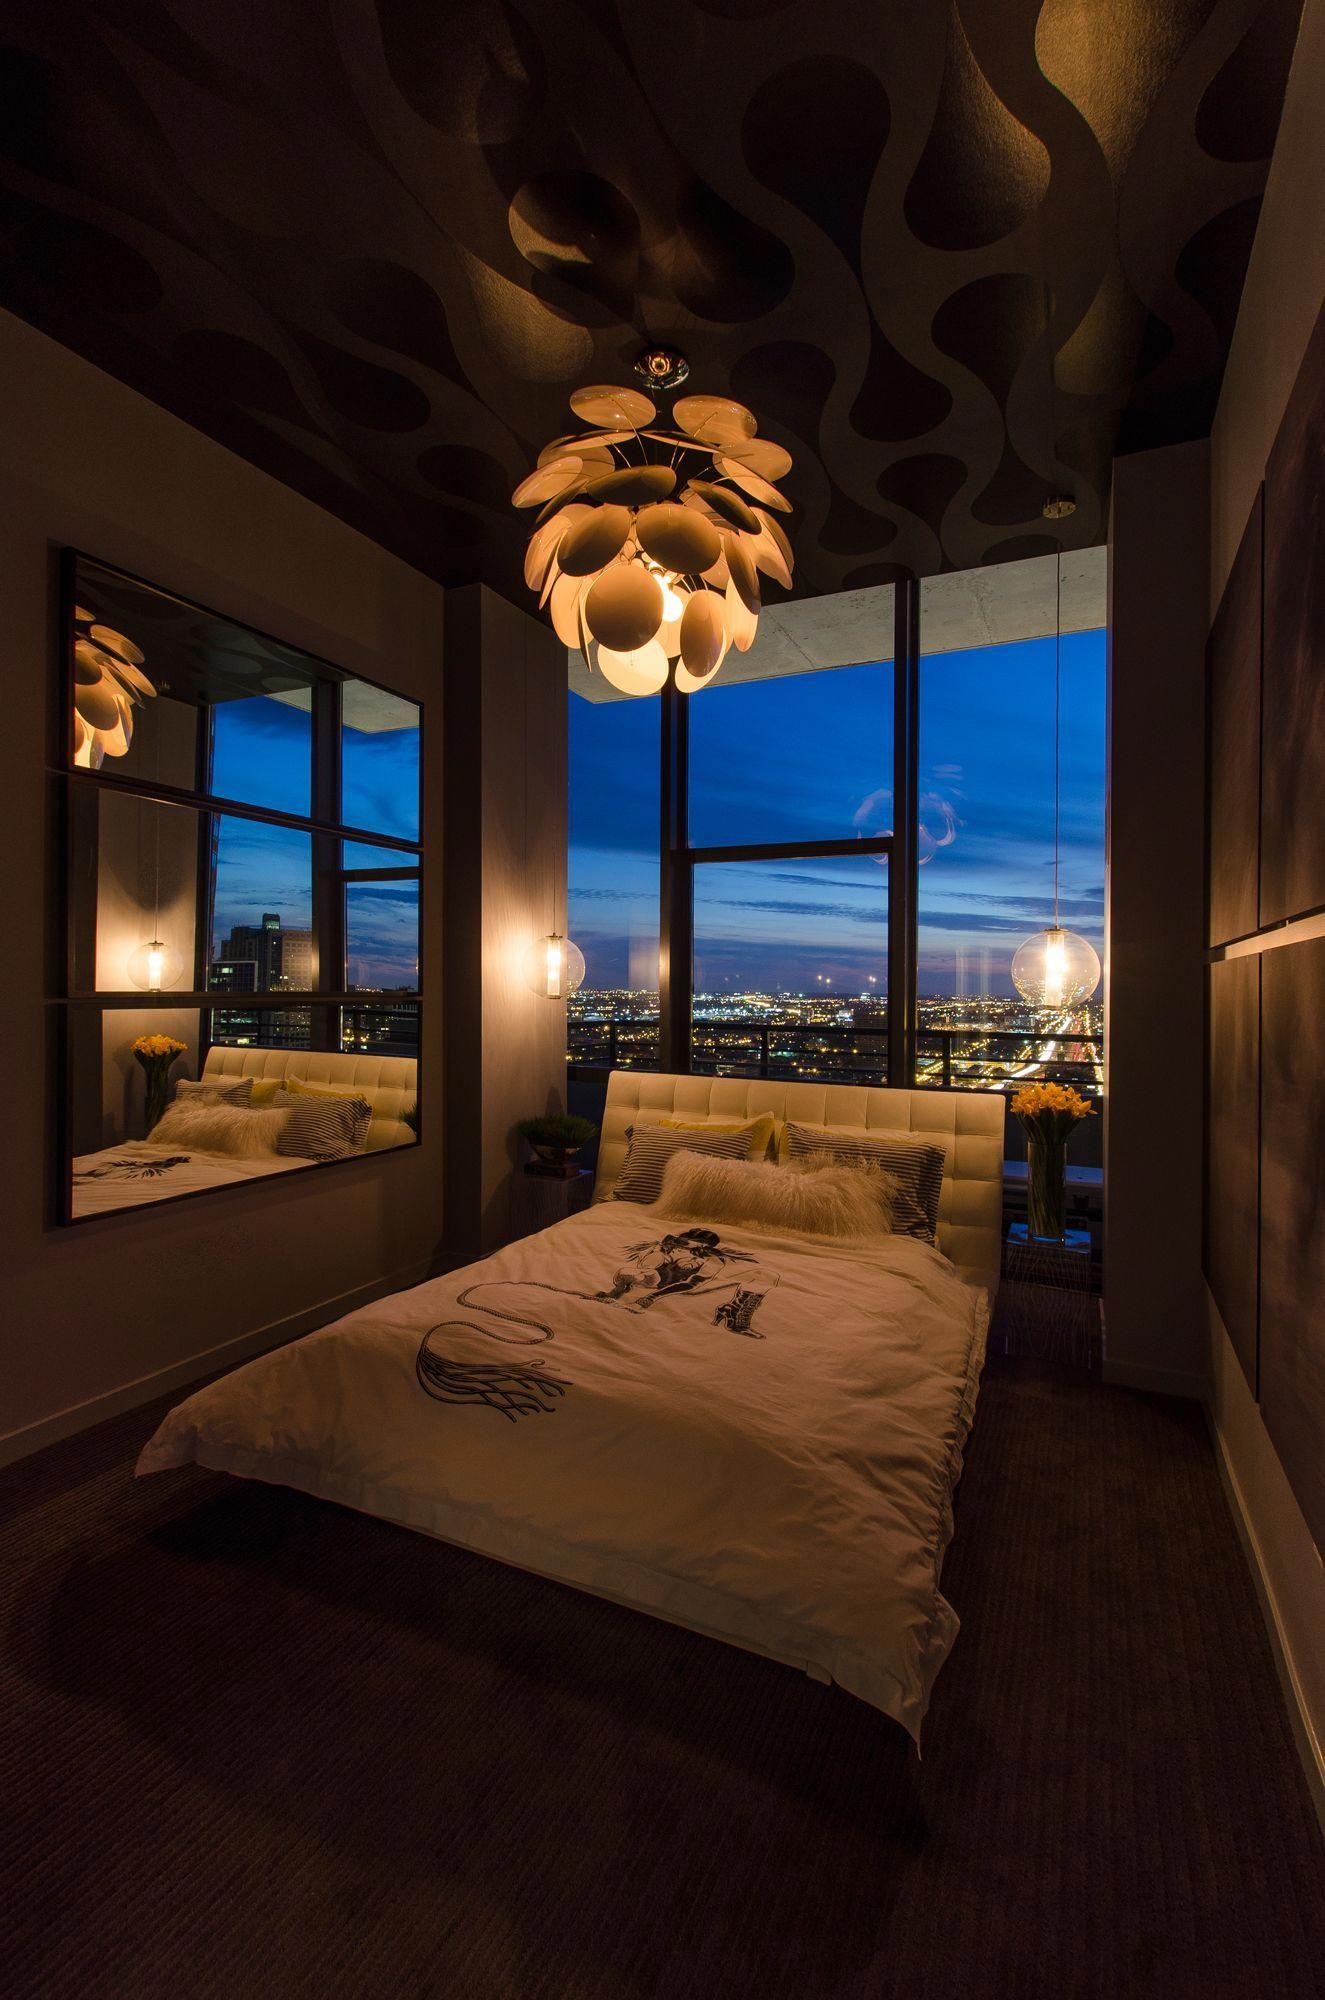 Luxury Bedroom with Unique Chandelier